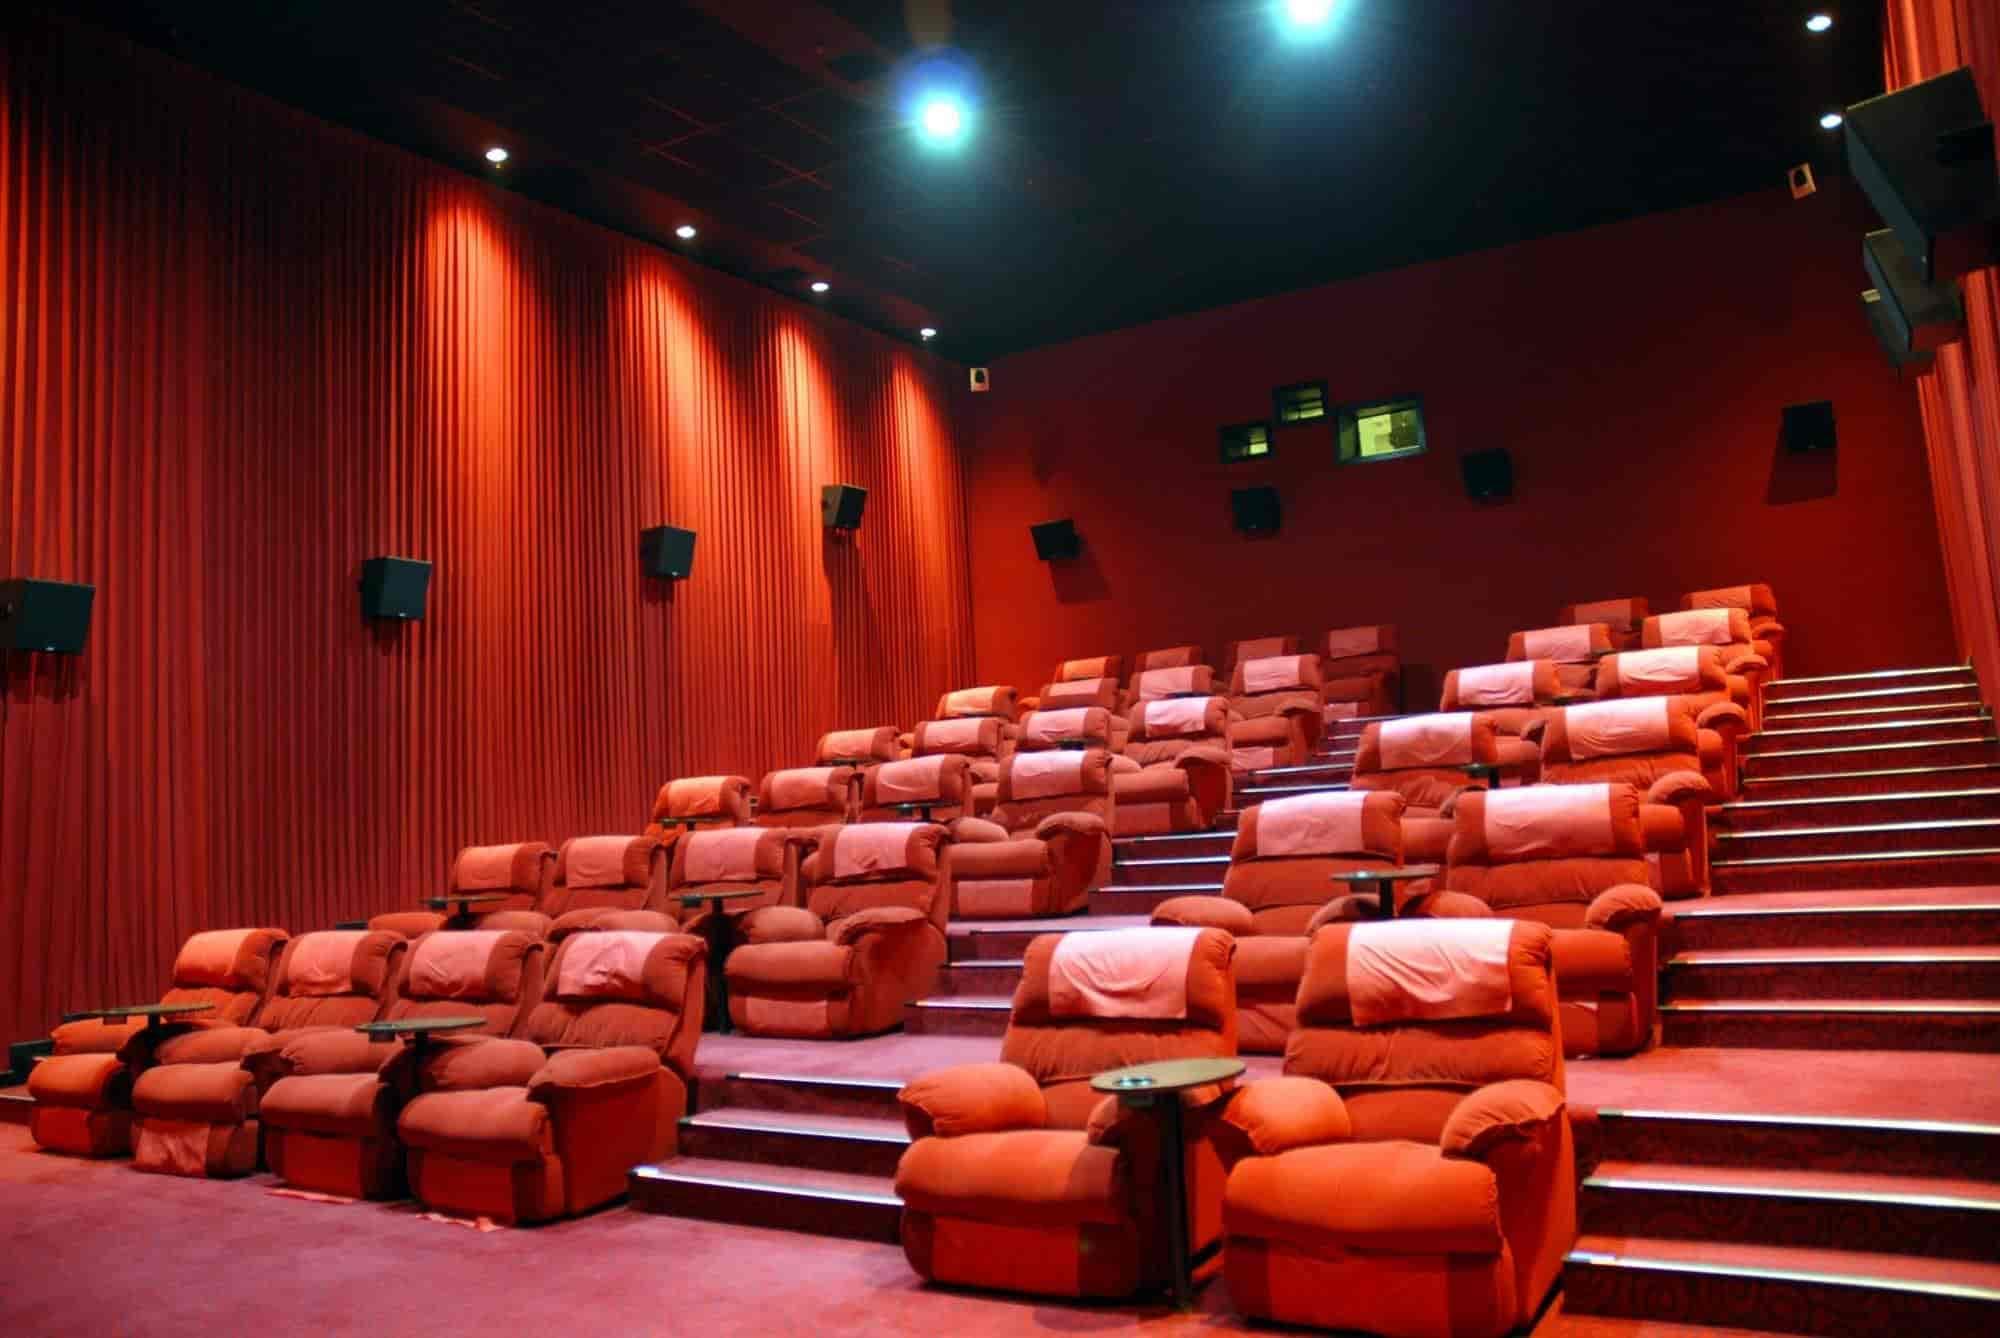 Spice Cinemas Photos Sector 25a Noida Pictures Images Gallery  -> Fotos De Cinemas